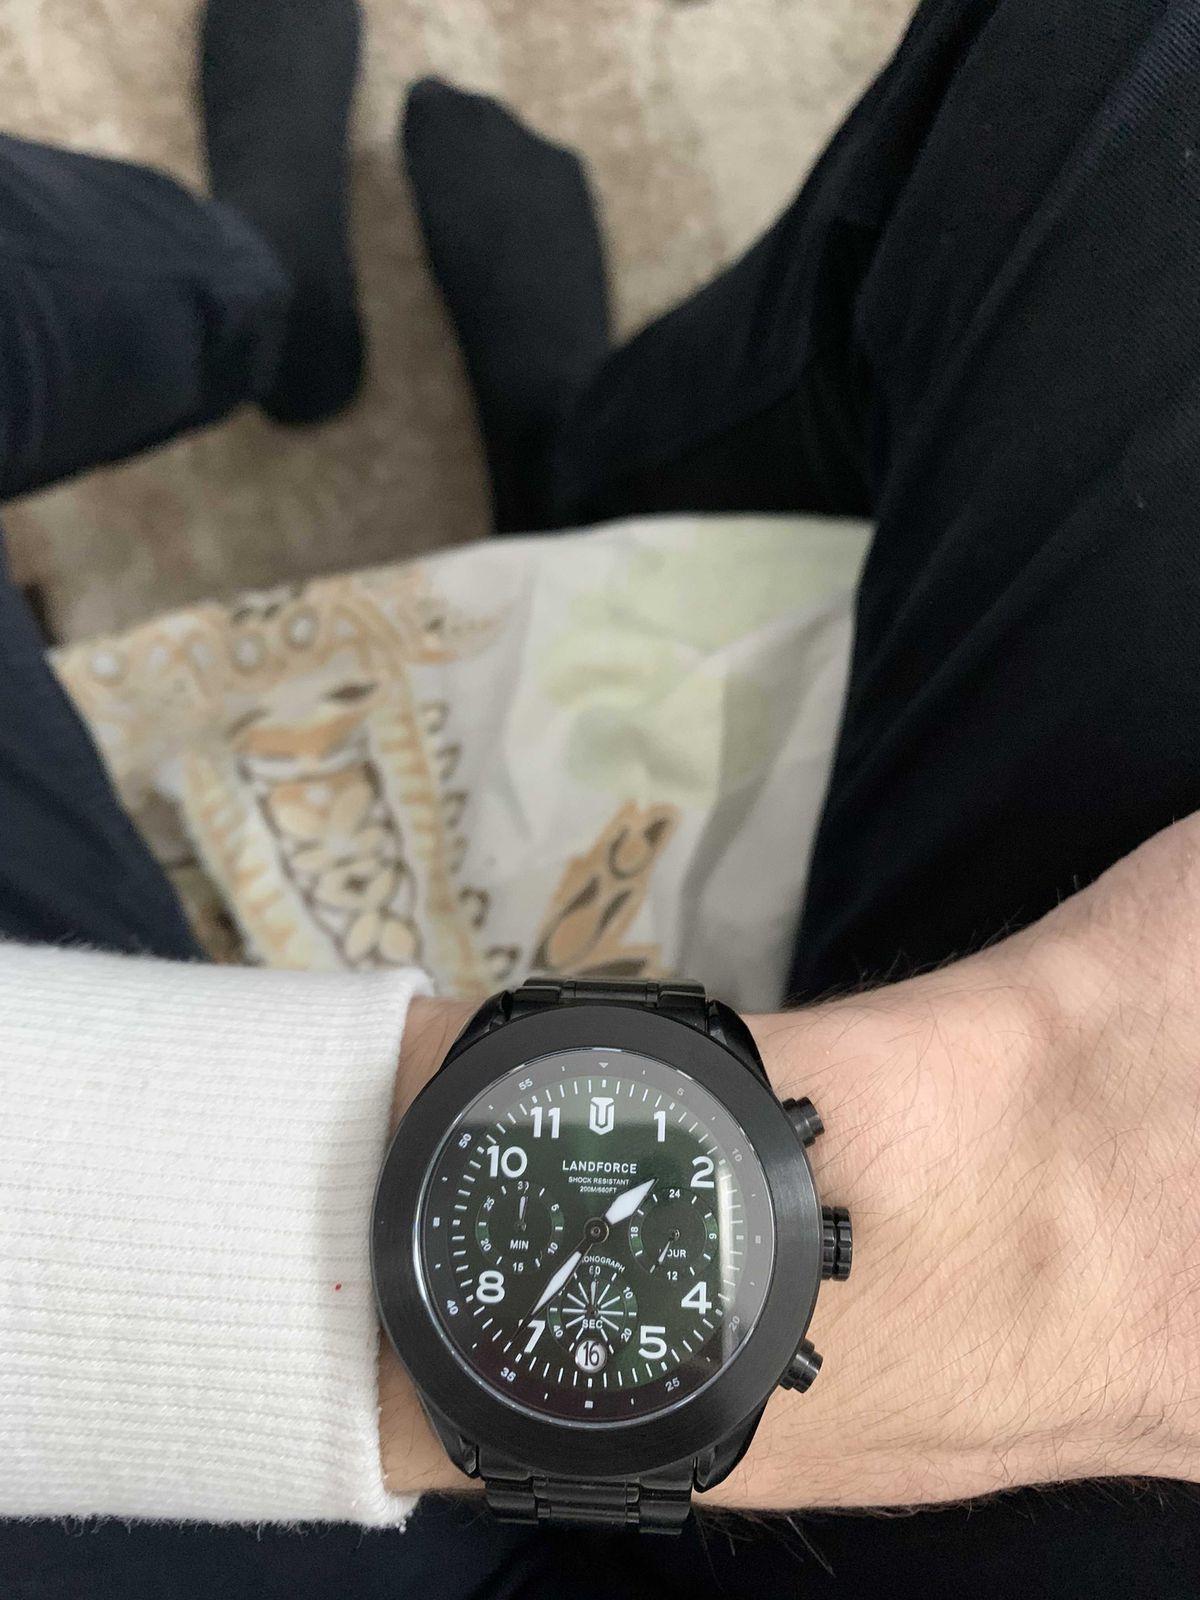 Часы Landforce, подарок на НГ